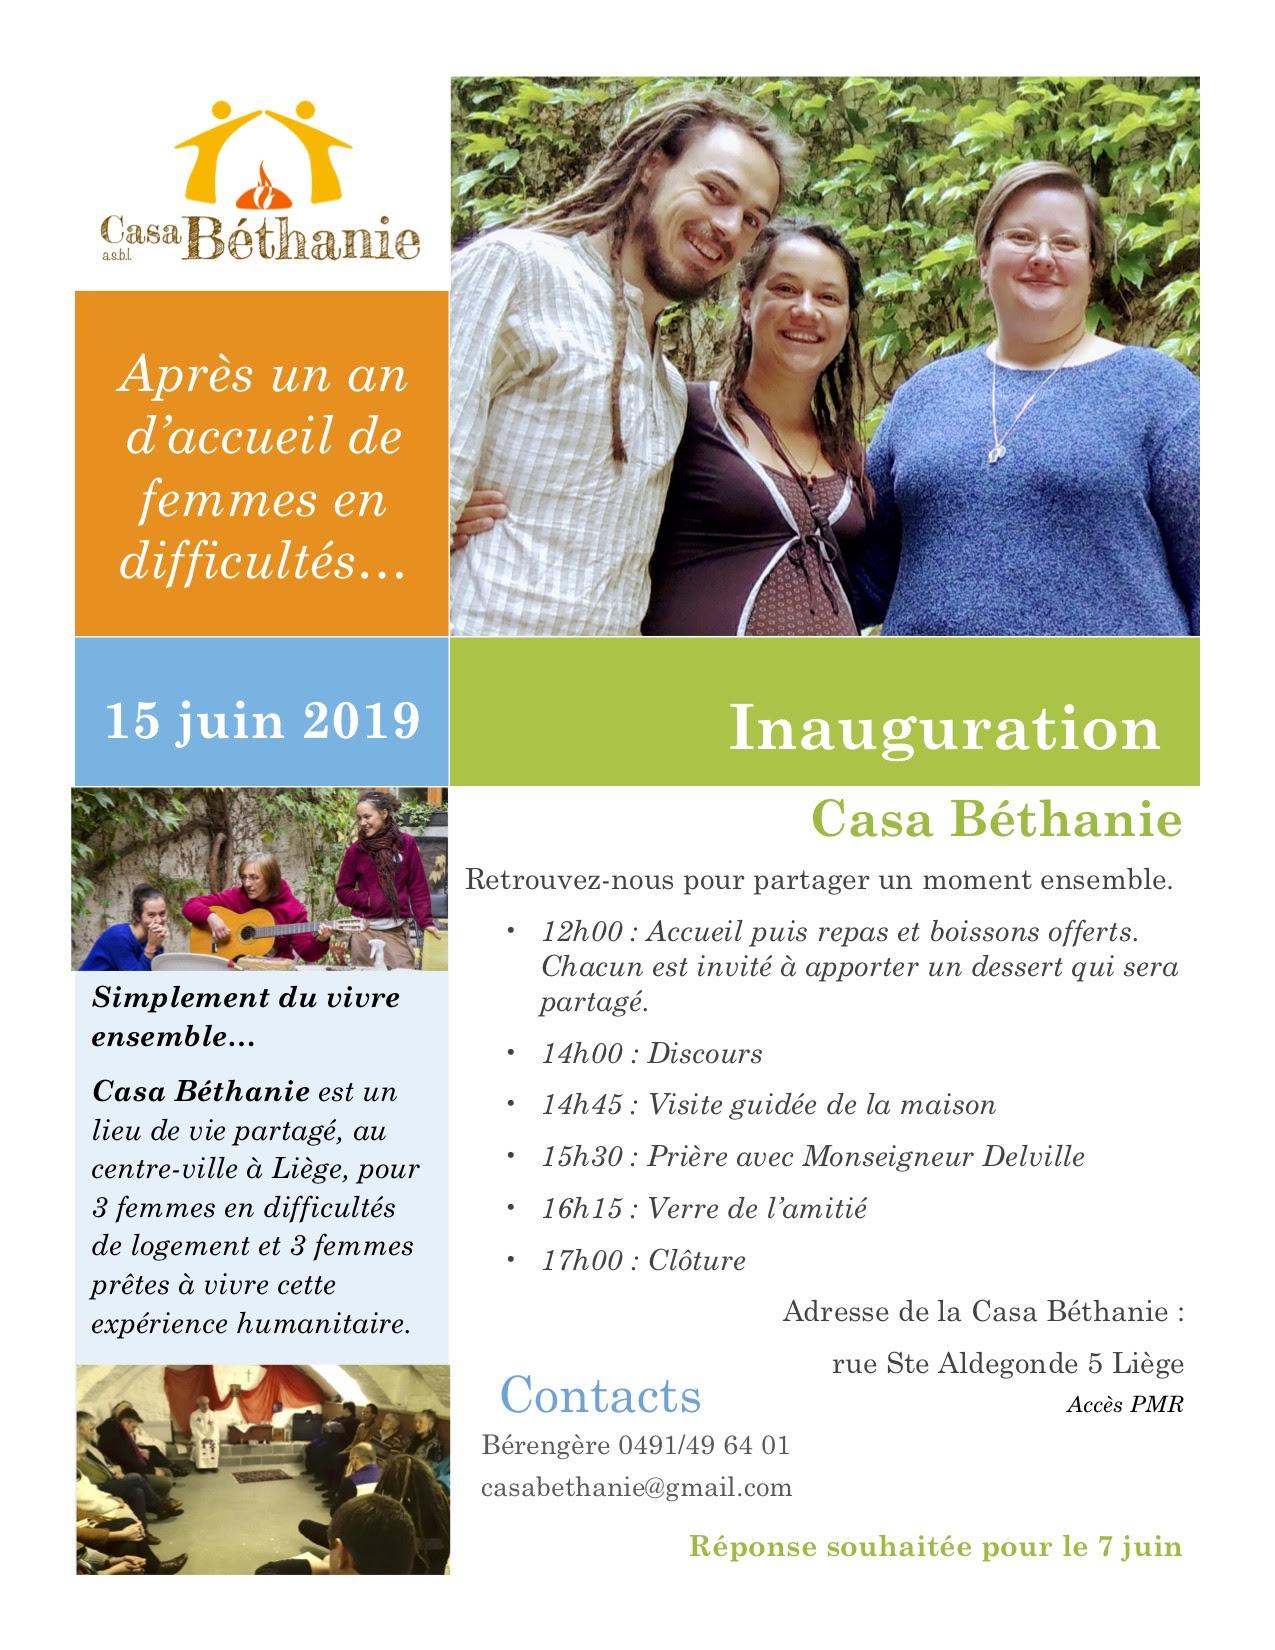 Inauguration de la Casa Bethanie avec Mgr Delville @ Casa Bethanie | Liège | Wallonie | Belgique